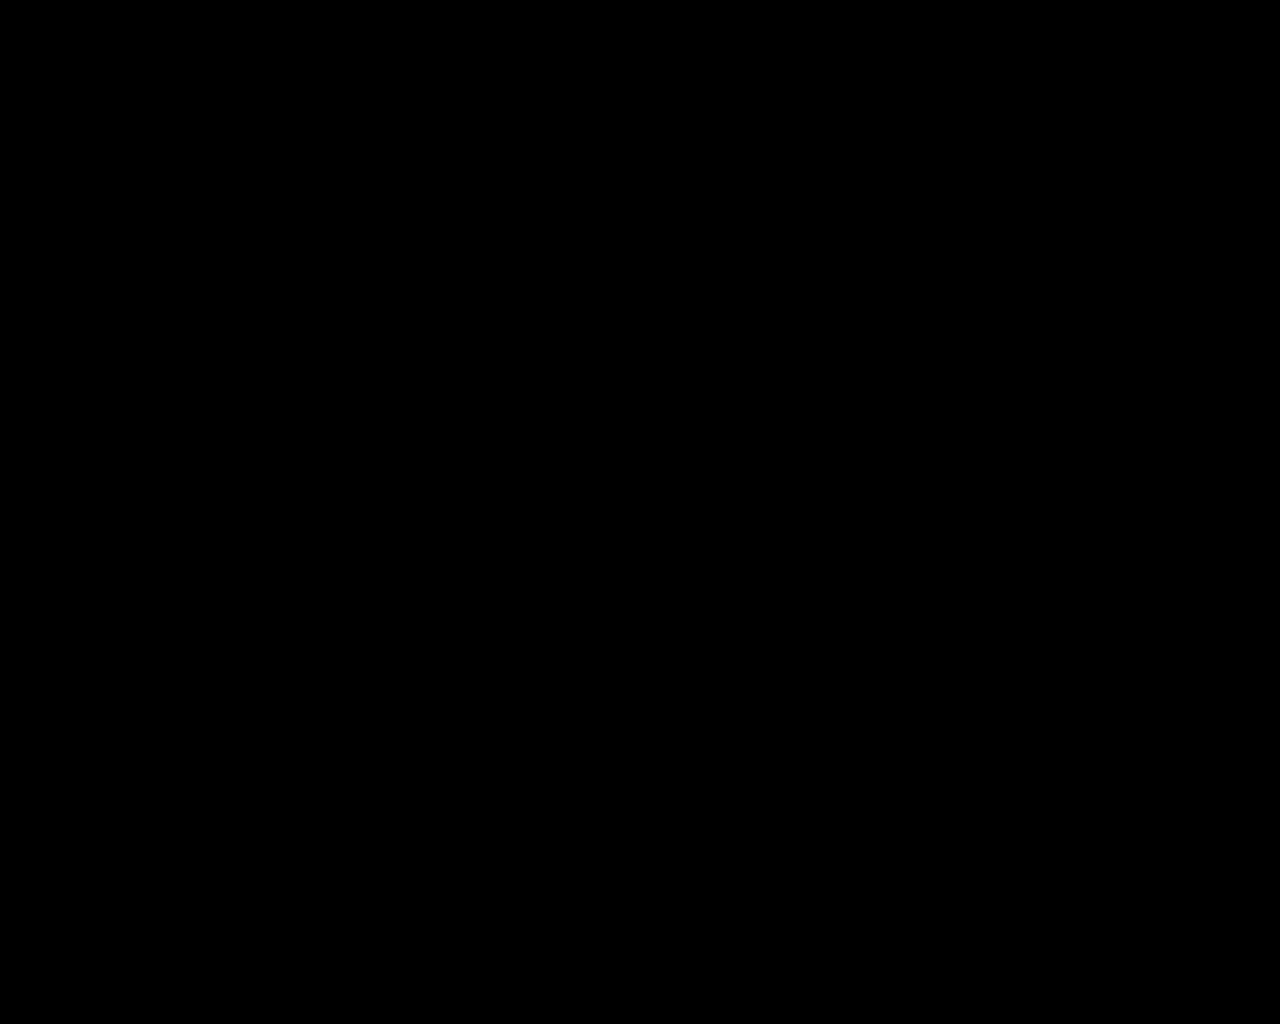 Variable resistance symbol